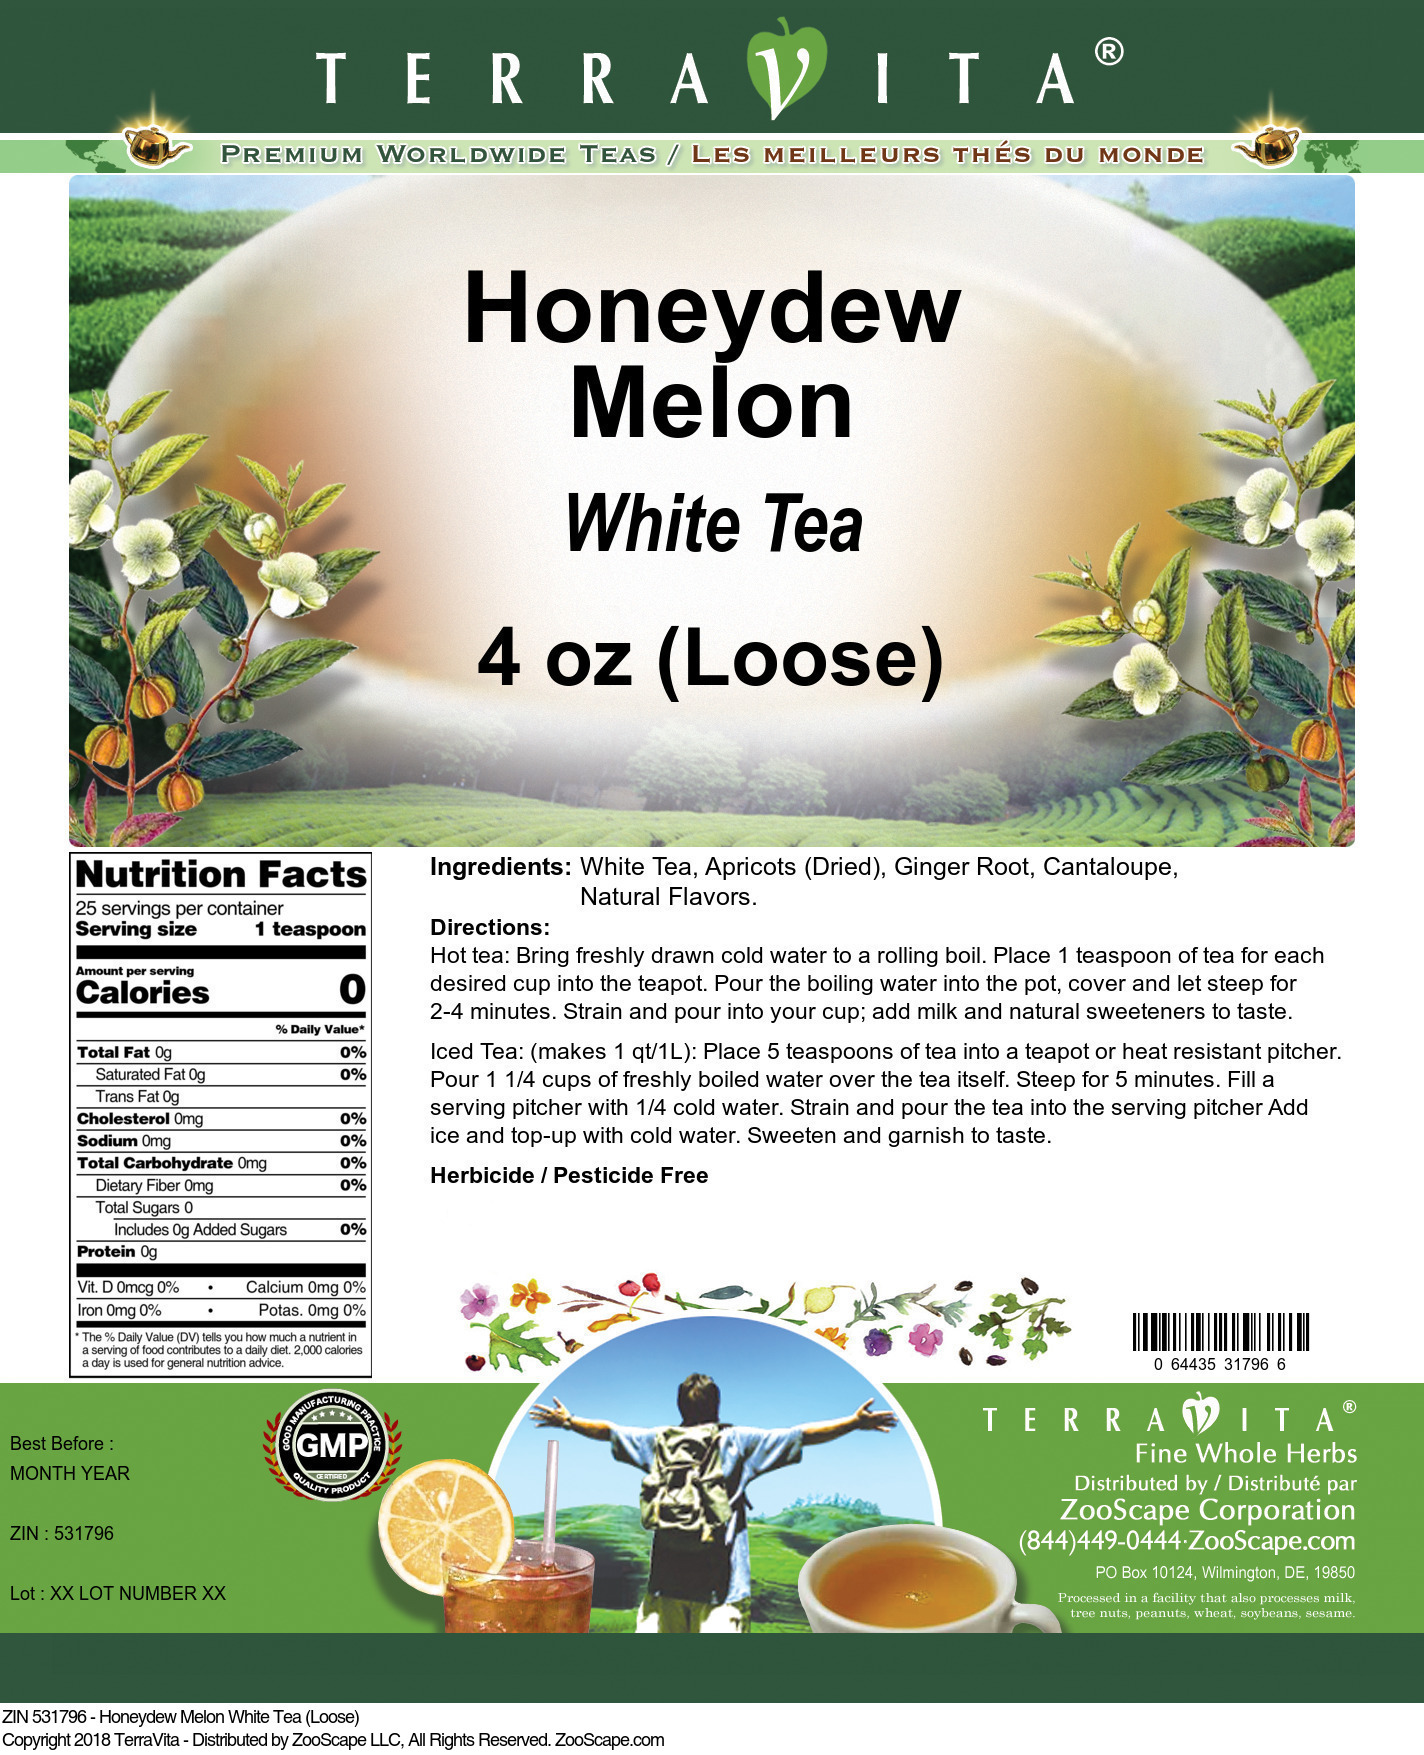 Honeydew Melon White Tea (Loose)